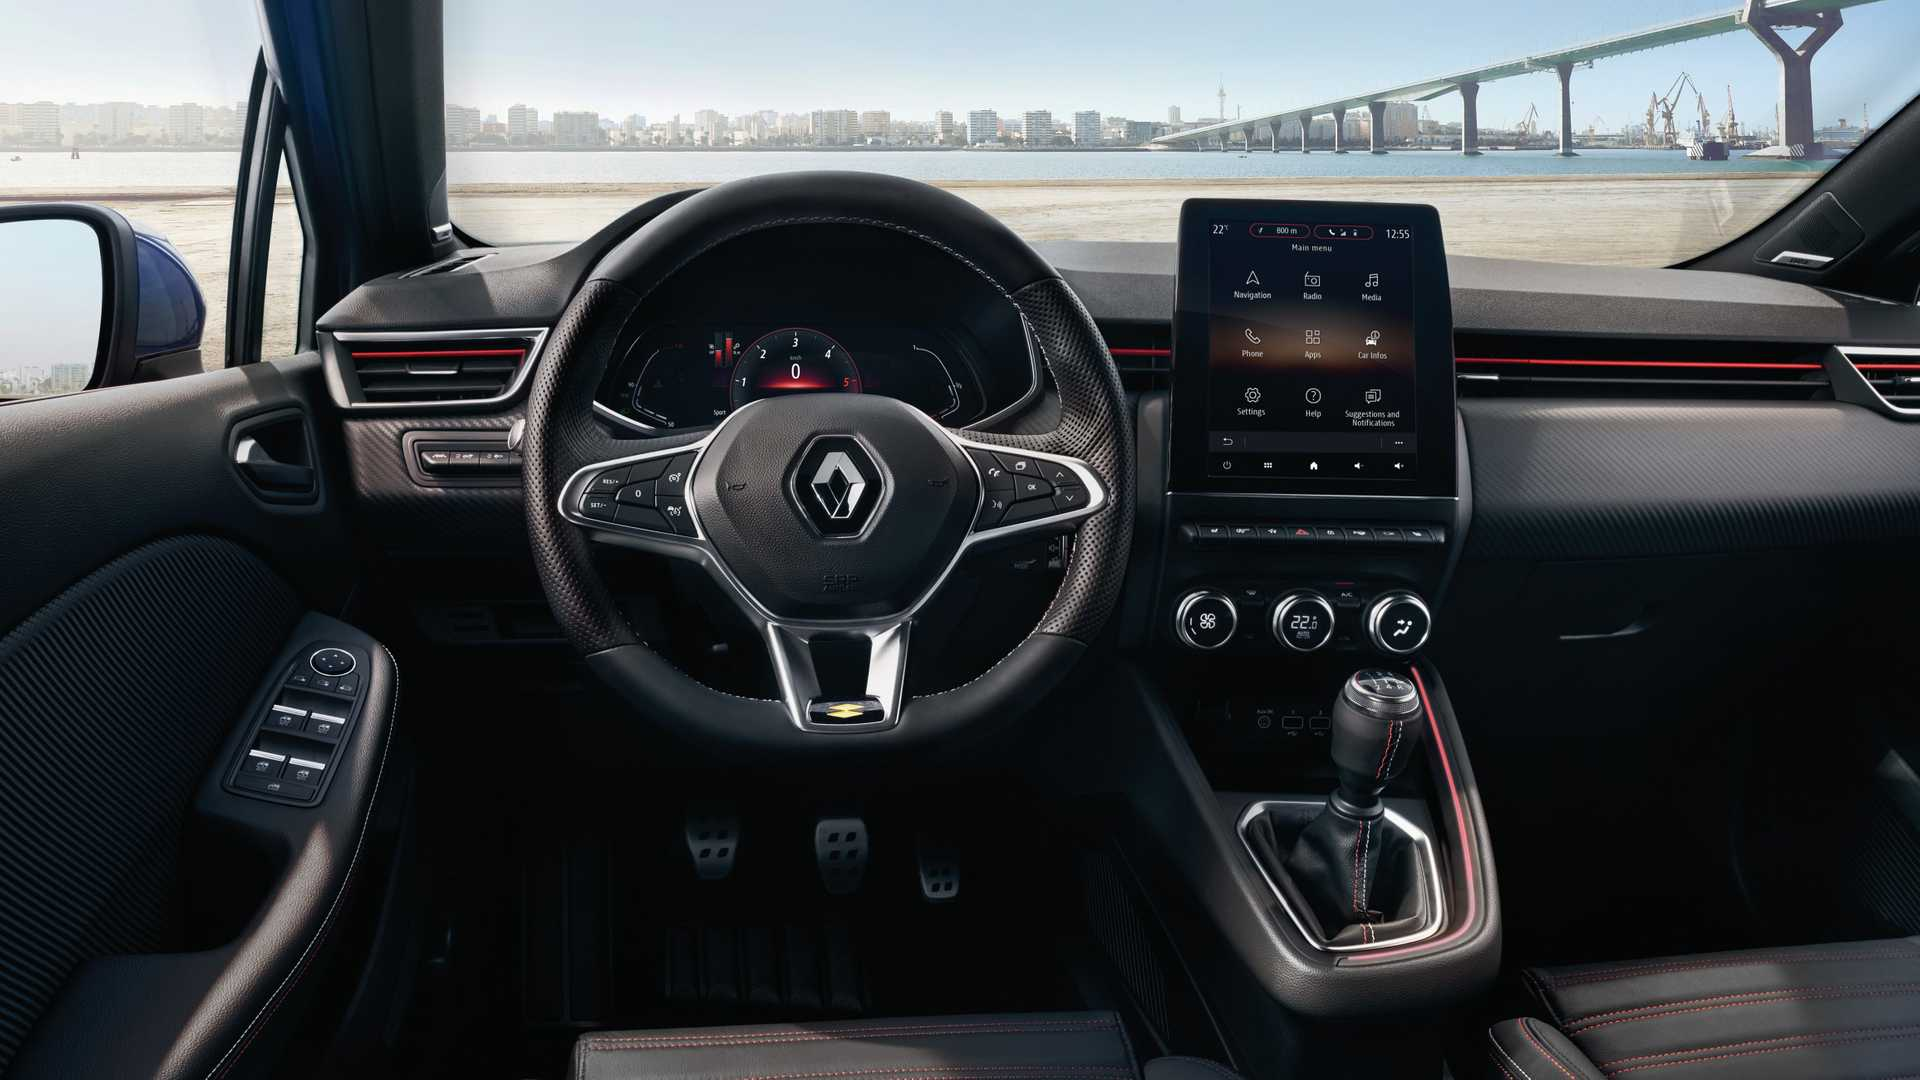 2019 Renault Clio V Revealed Ahead of Geneva Debut 10